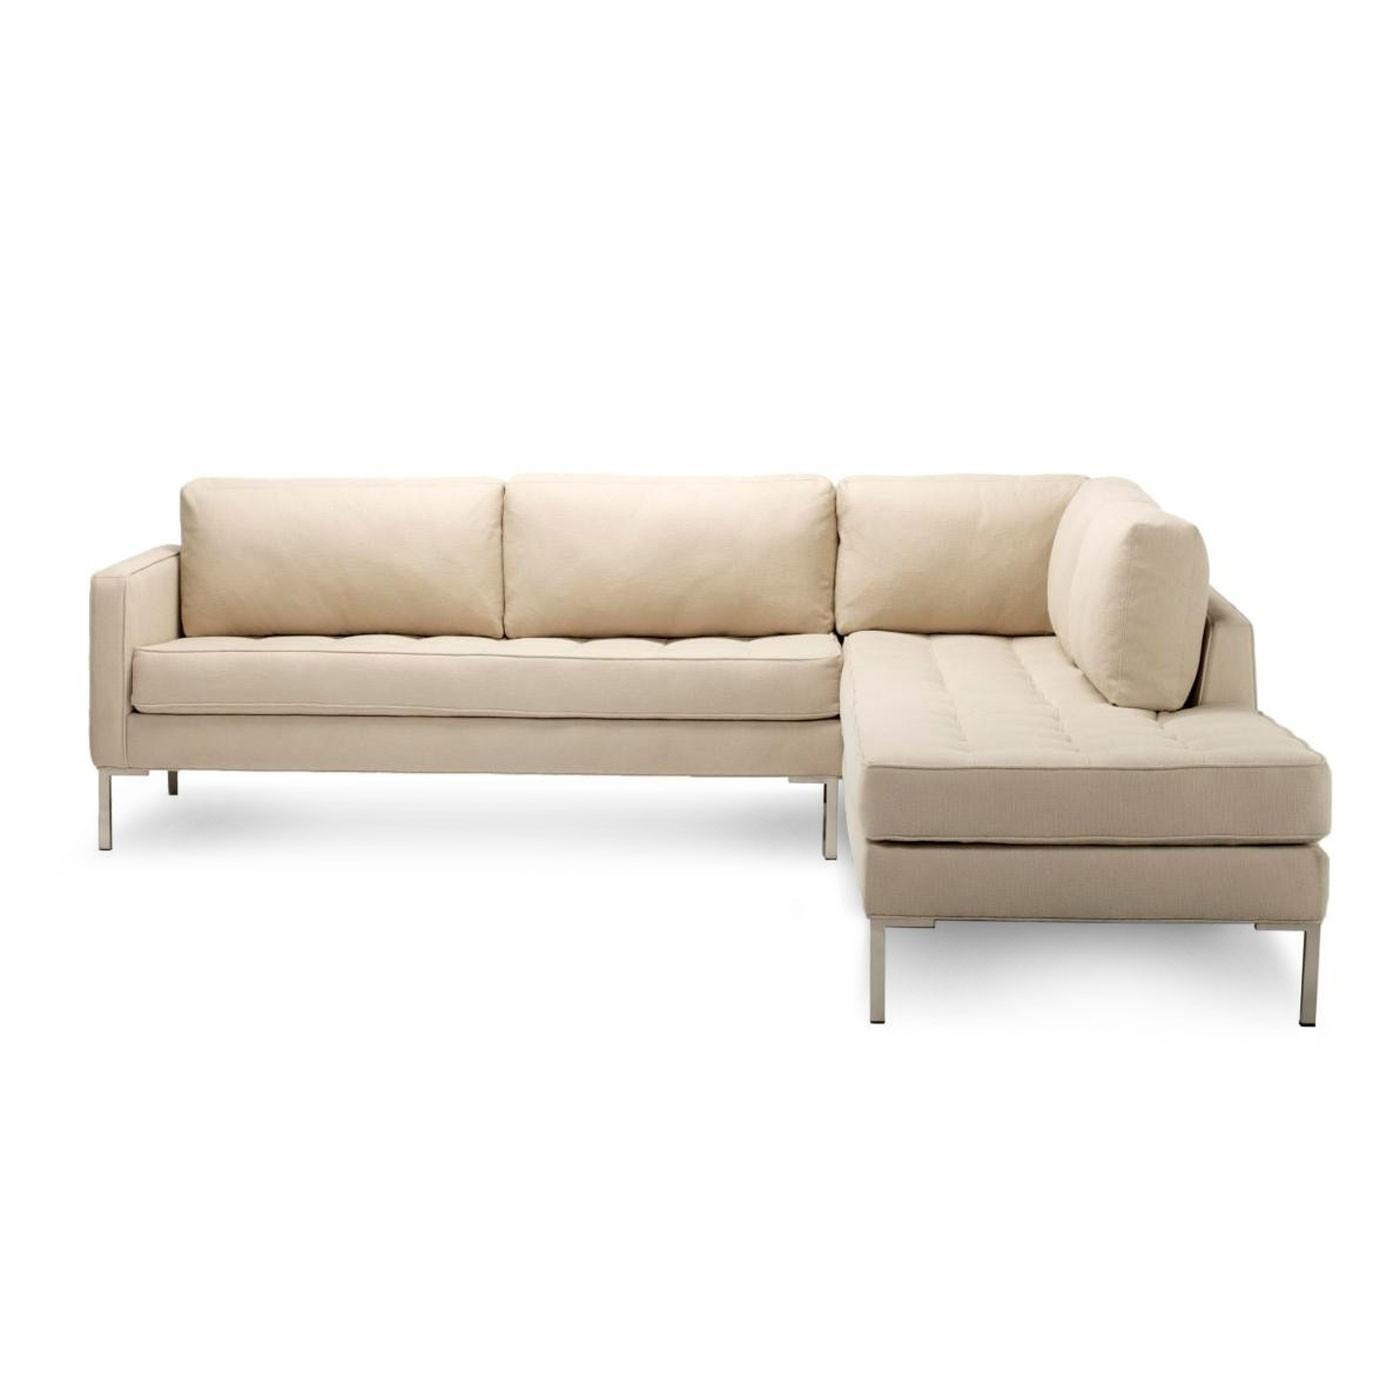 Furniture: Sofa For Sale | Armless Sofas | Armless Settee Regarding Armless Sectional Sofas (Image 6 of 15)